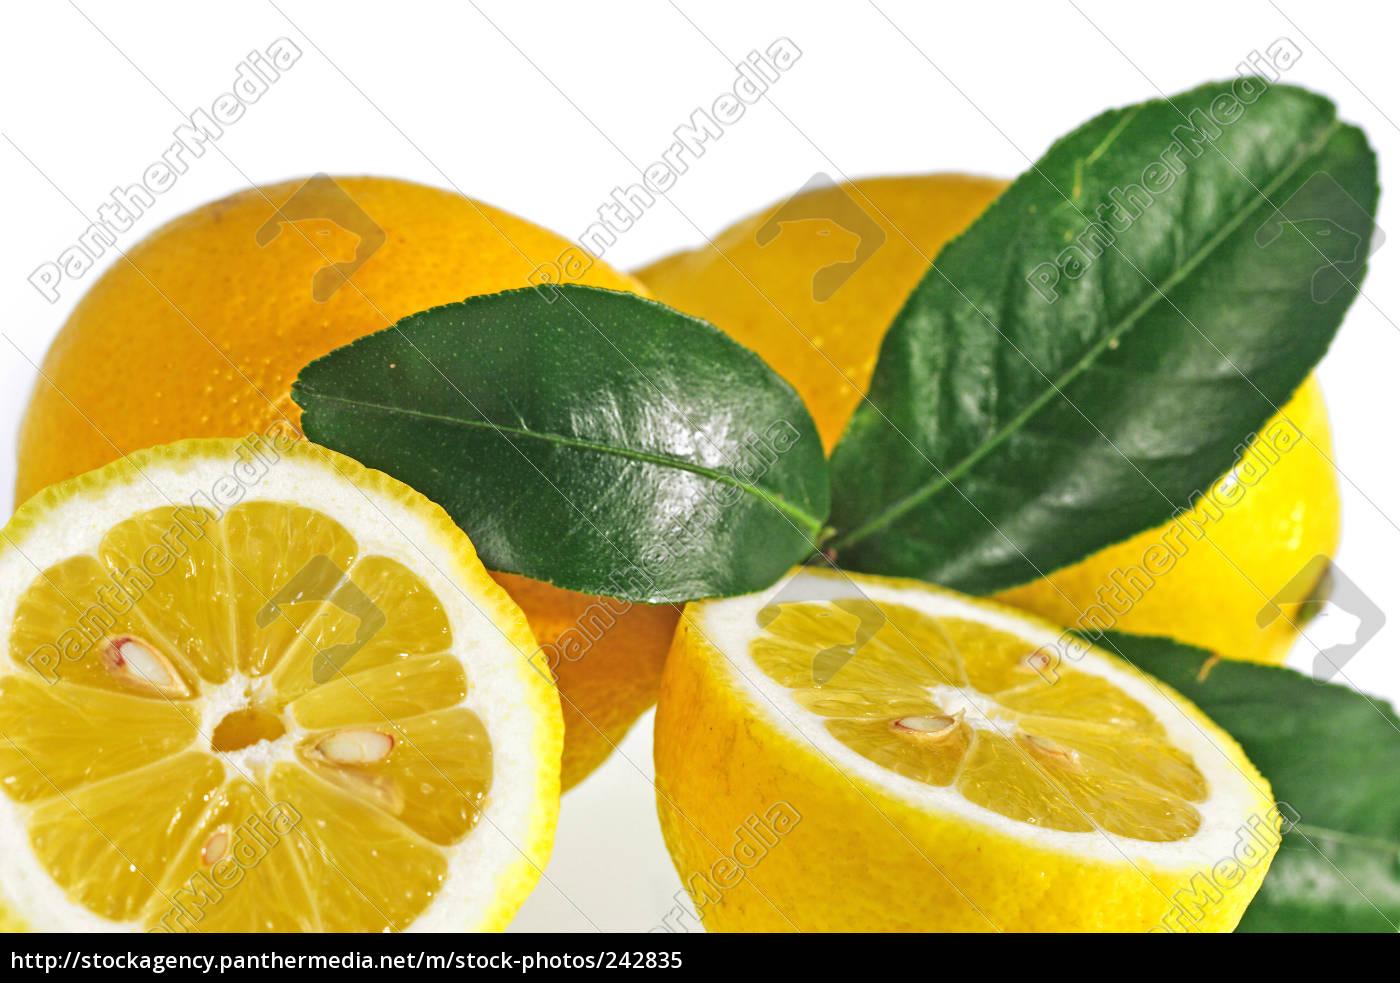 lemons - 242835